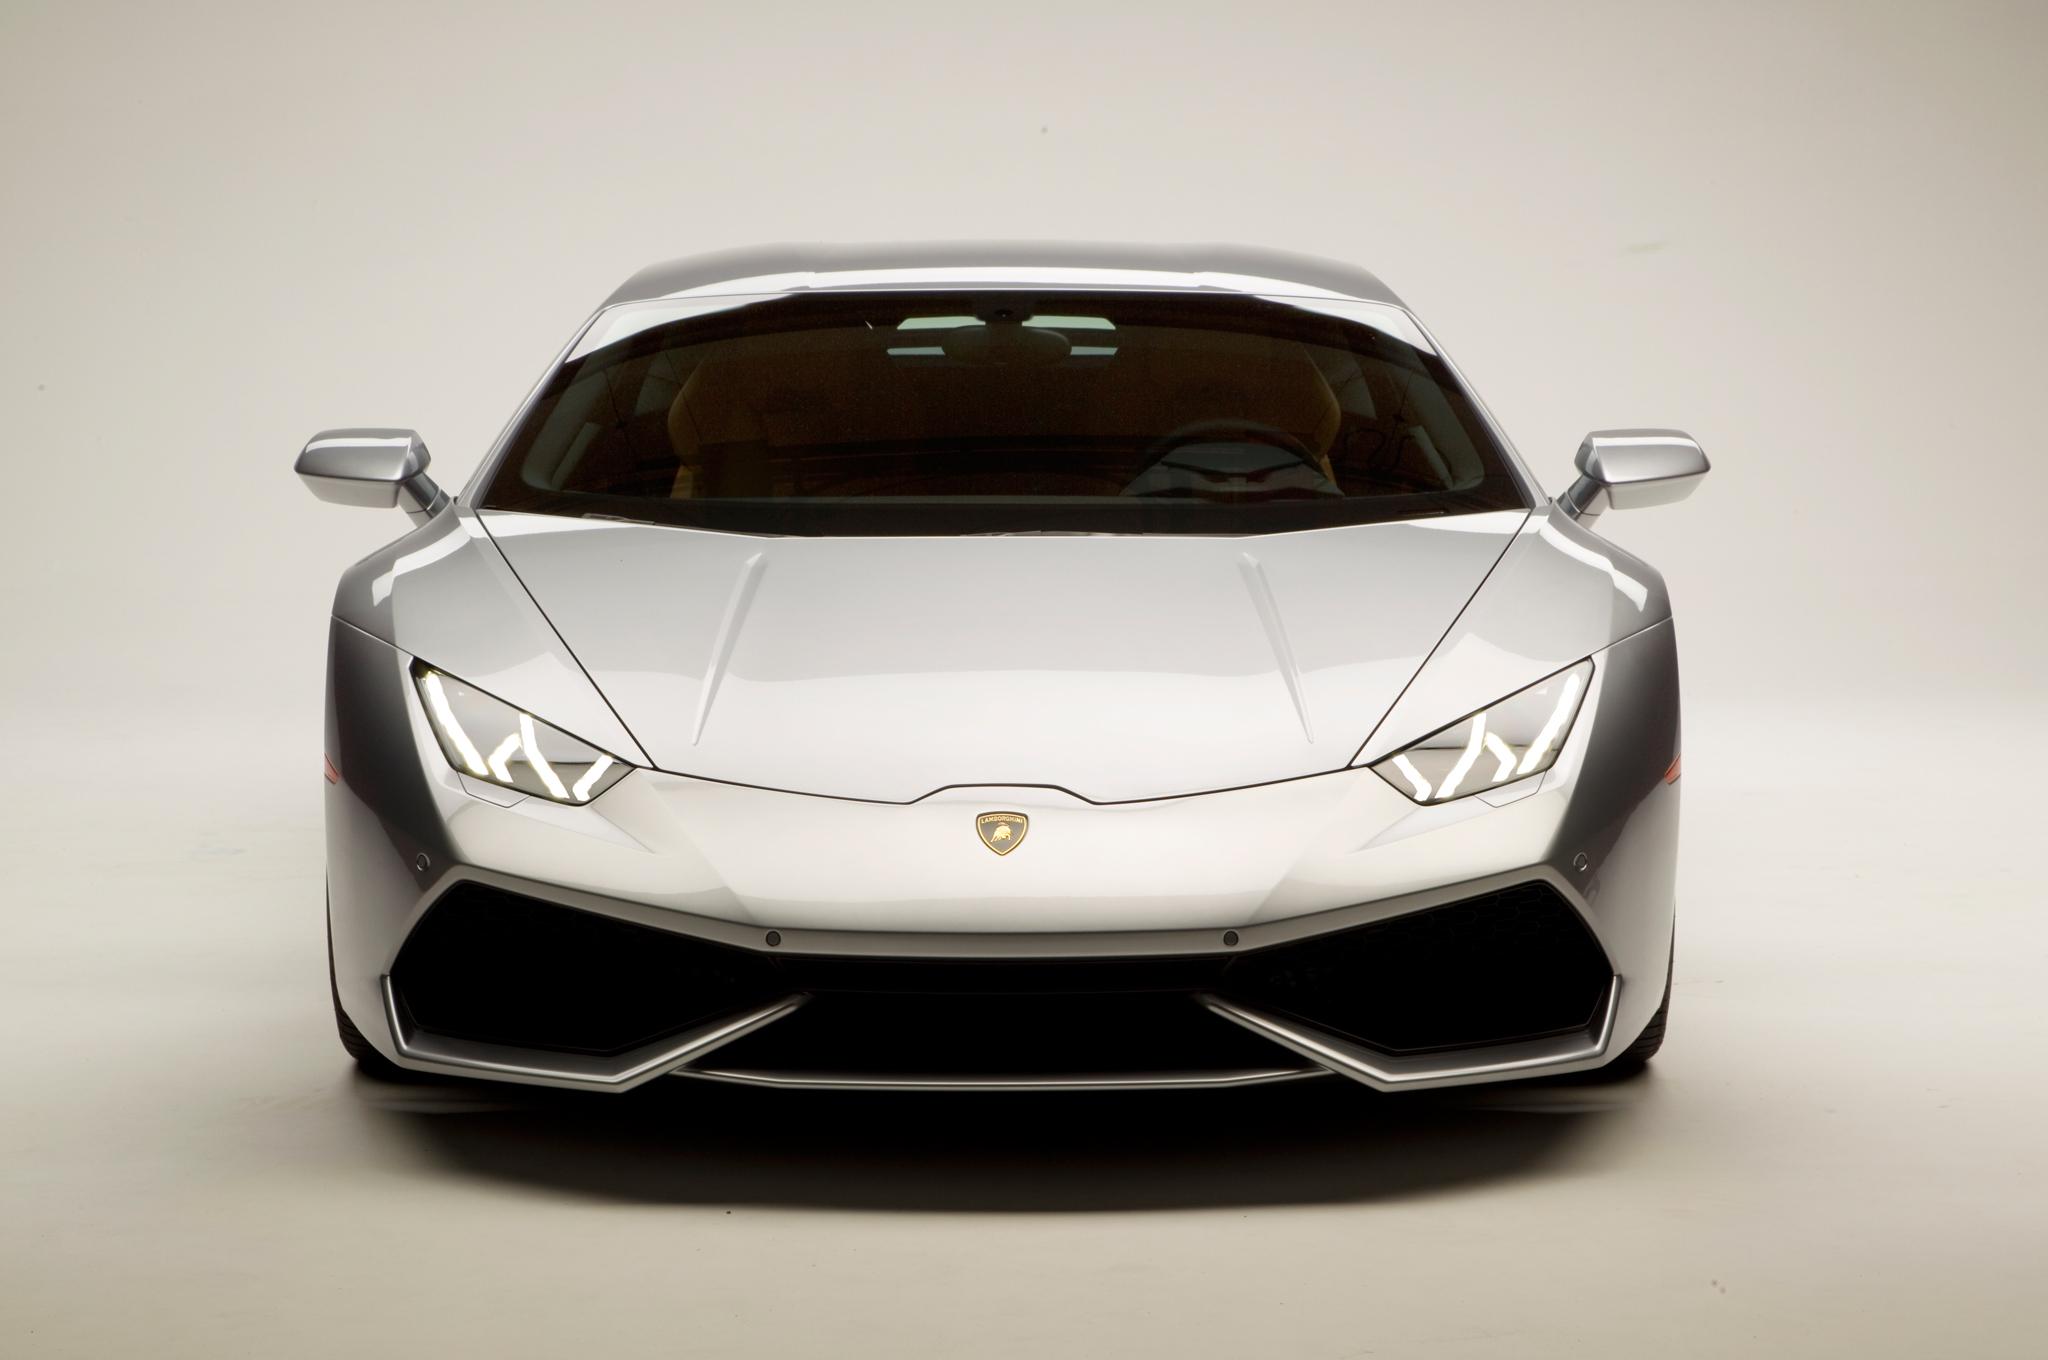 2015 Lamborghini Huracan vue devant